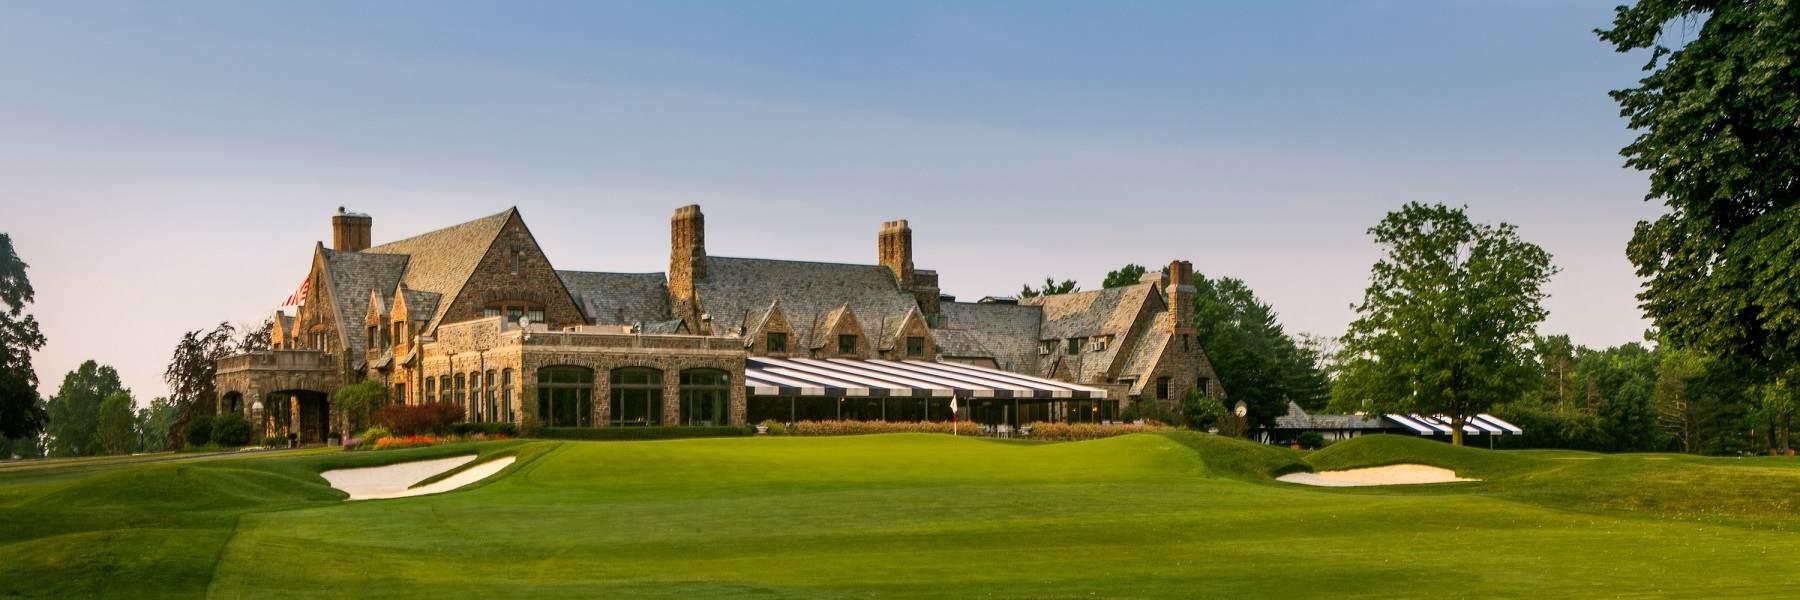 Winged Foot Golf Club no Mamaroneck-New York